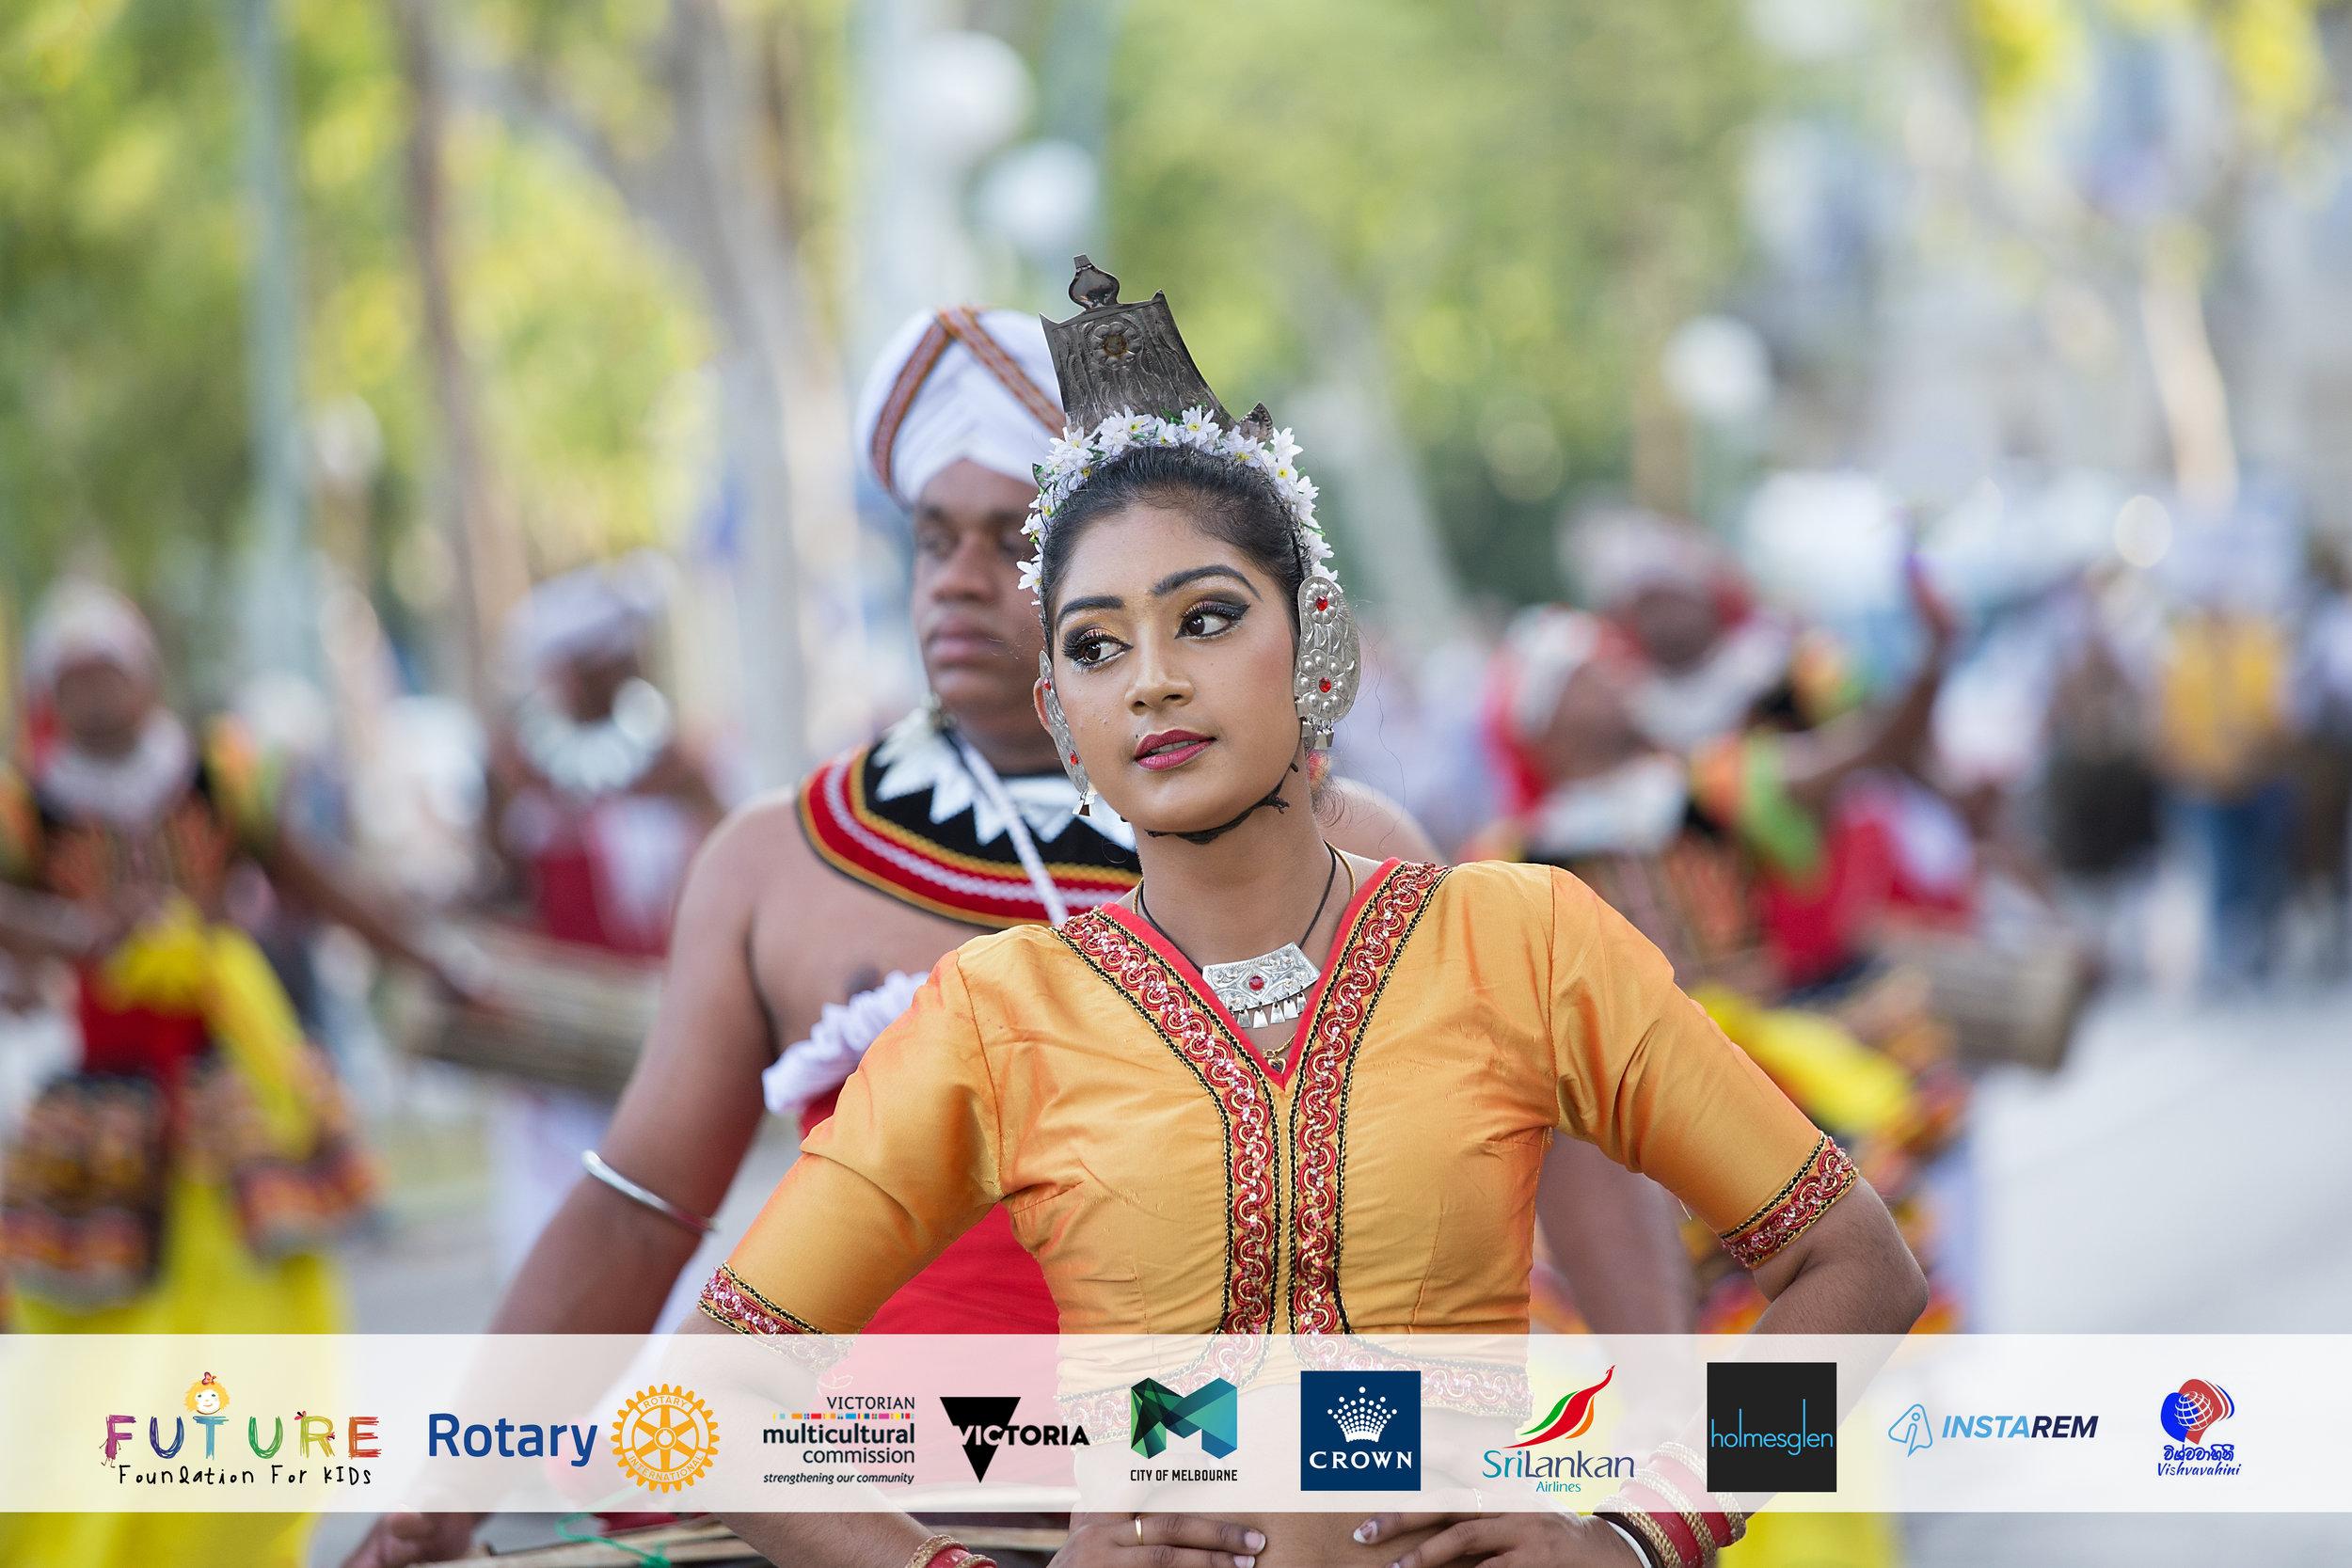 Lankan Fest 2018 - 25th February 2018 from 9am - 7pm @ Crown Riverwalk